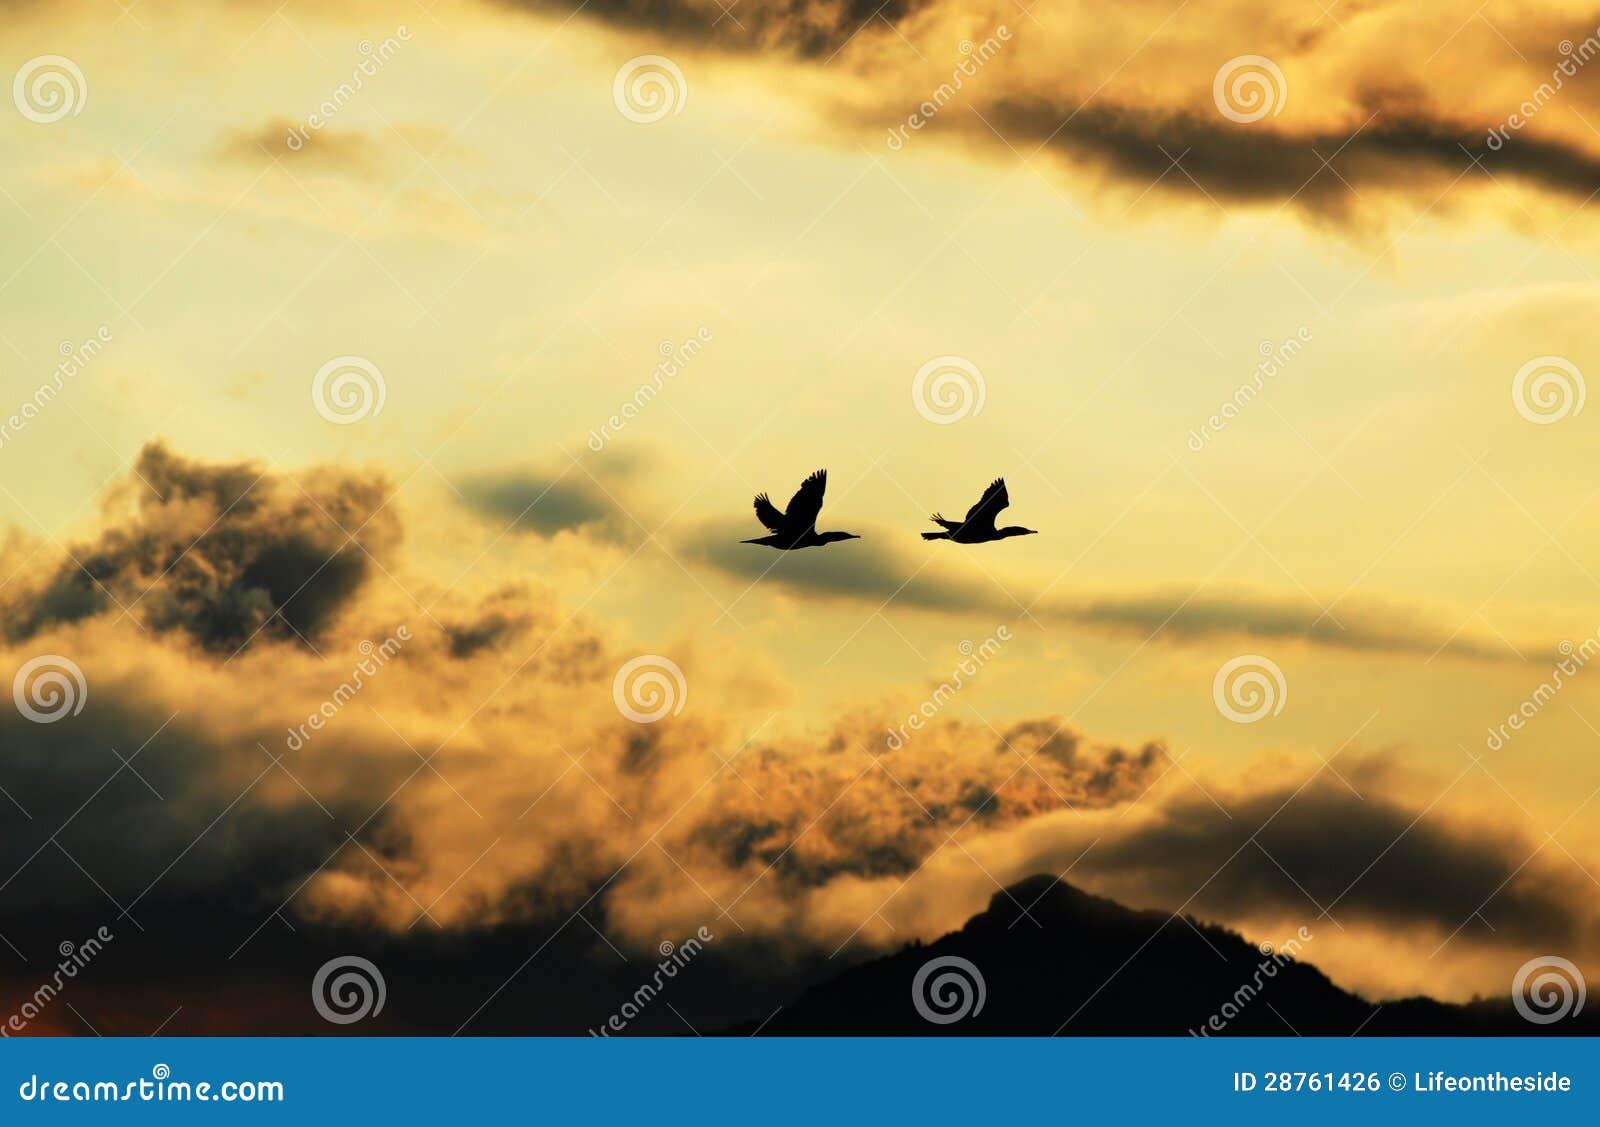 Silhouet van vogels die huis in donkere onweerswolken vliegen